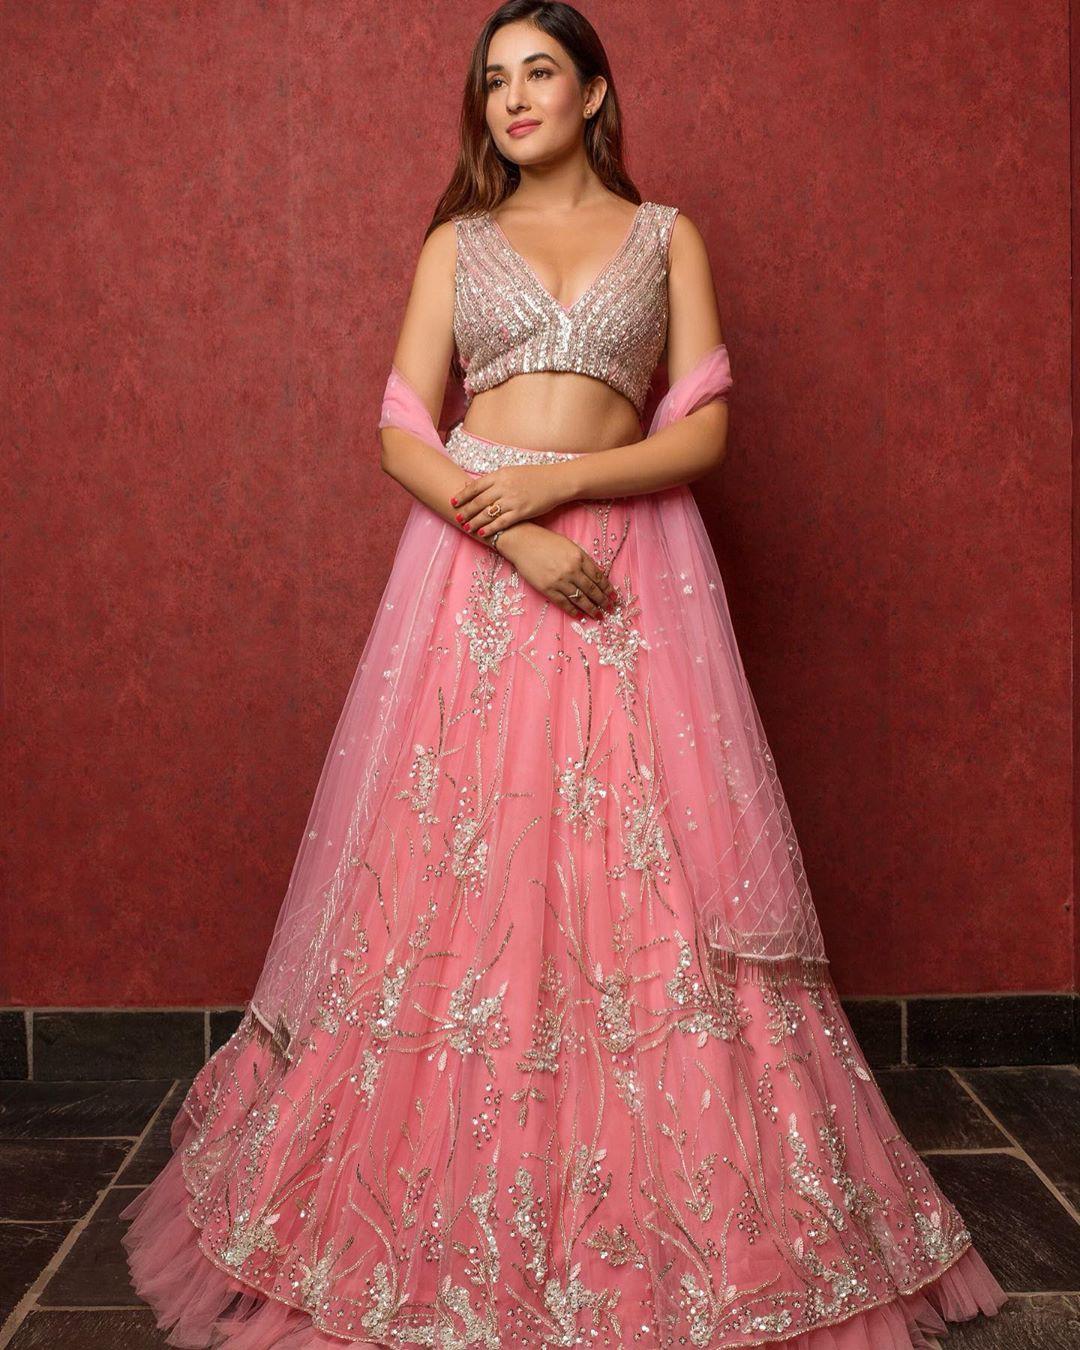 Aditi budhathoki reshort dress